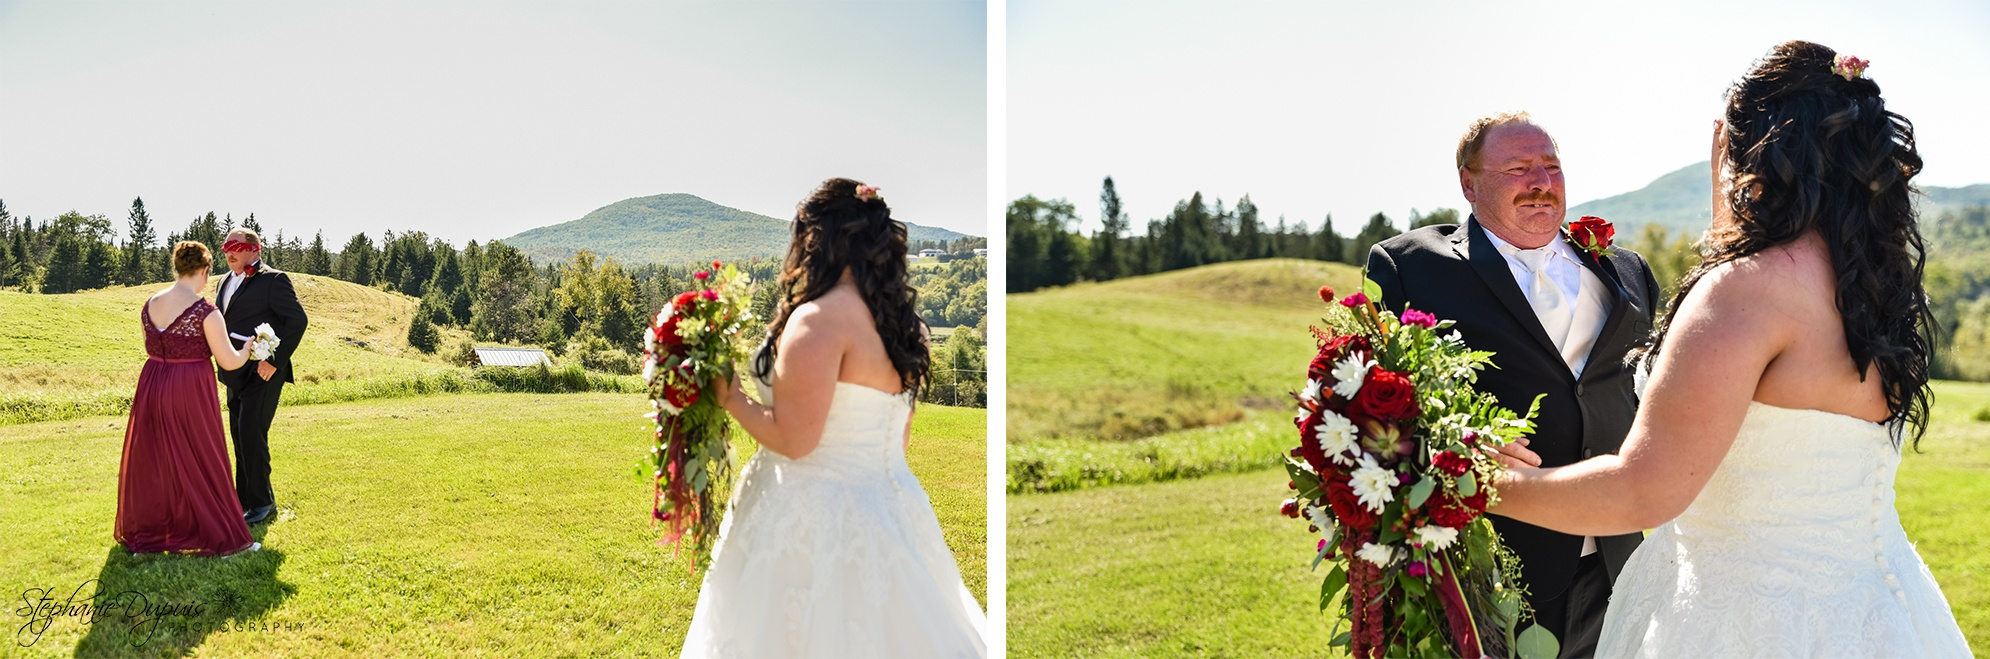 Jefferson Wedding Photographer 03 2 - Portfolio: Brown Wedding